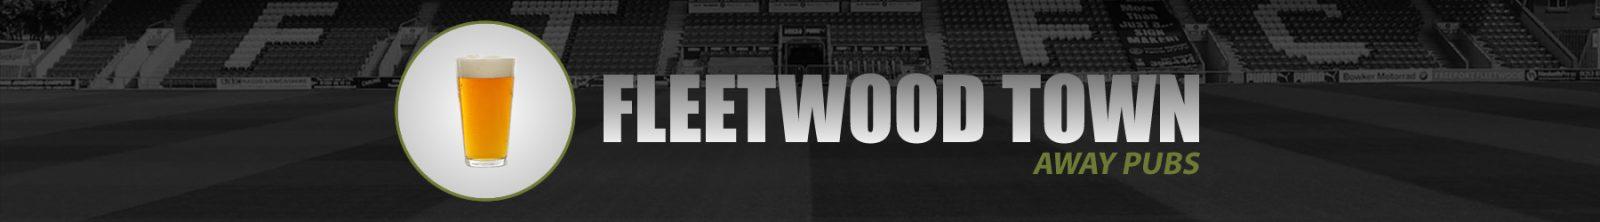 Fleetwood Town Away Pubs